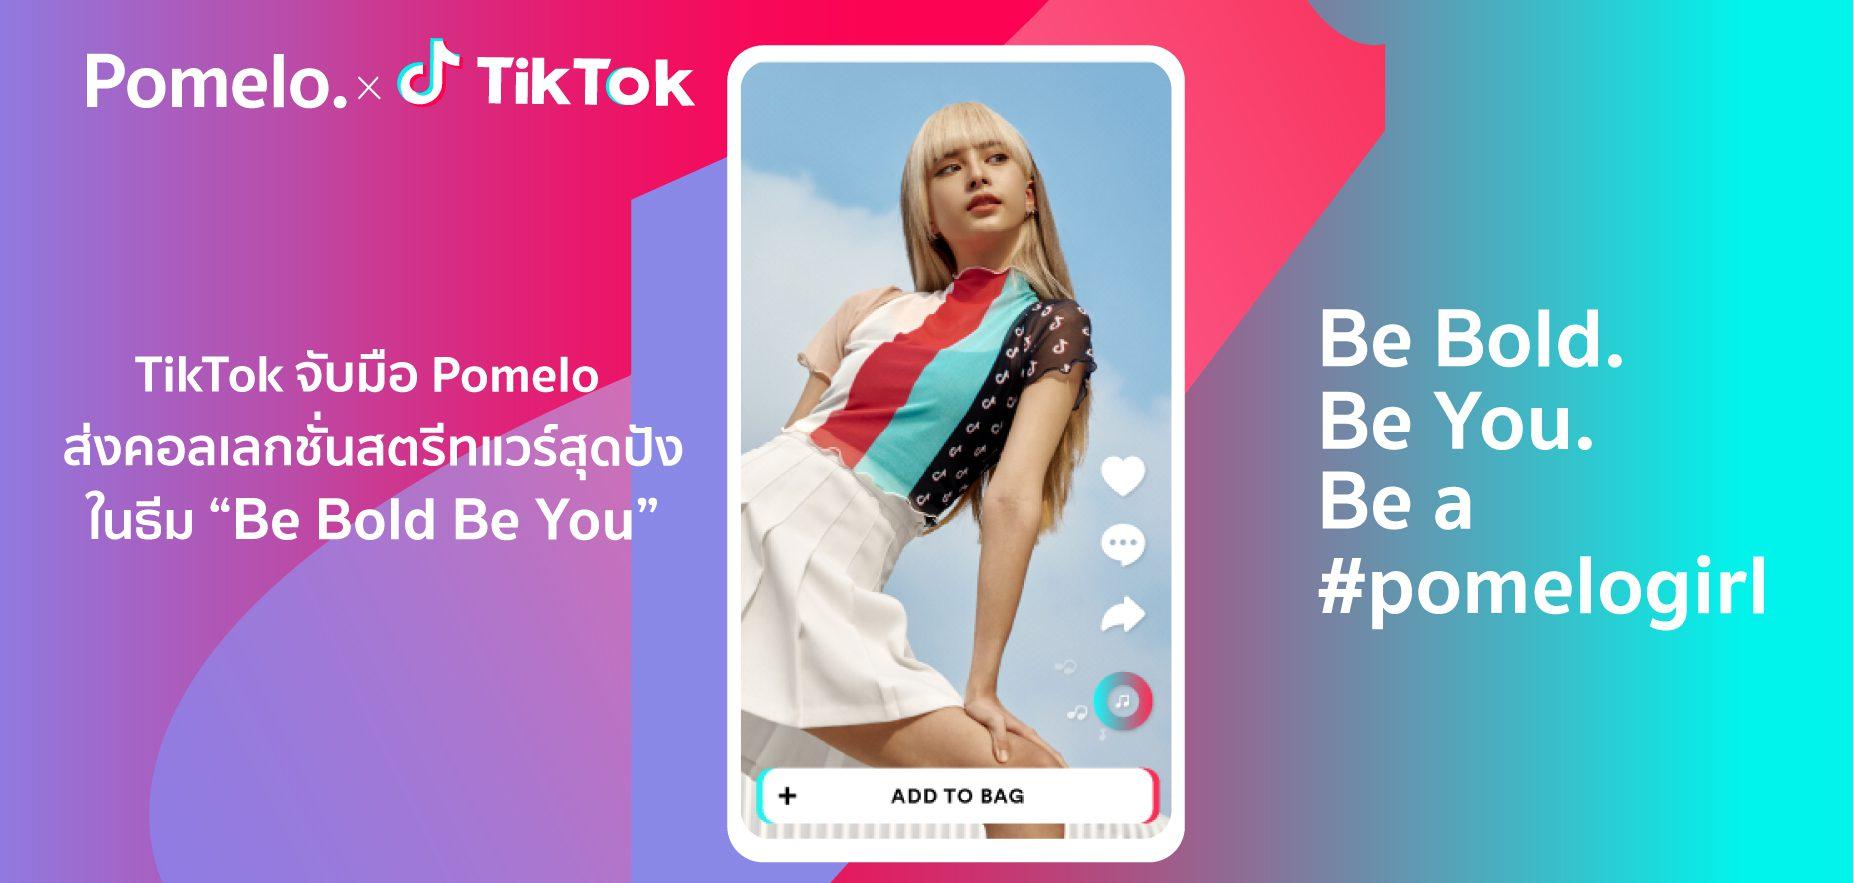 "TikTok จับมือ Pomelo ส่งคอลเลกชั่นสตรีทแวร์สุดปังในธีม ""Be Bold Be YOU"""